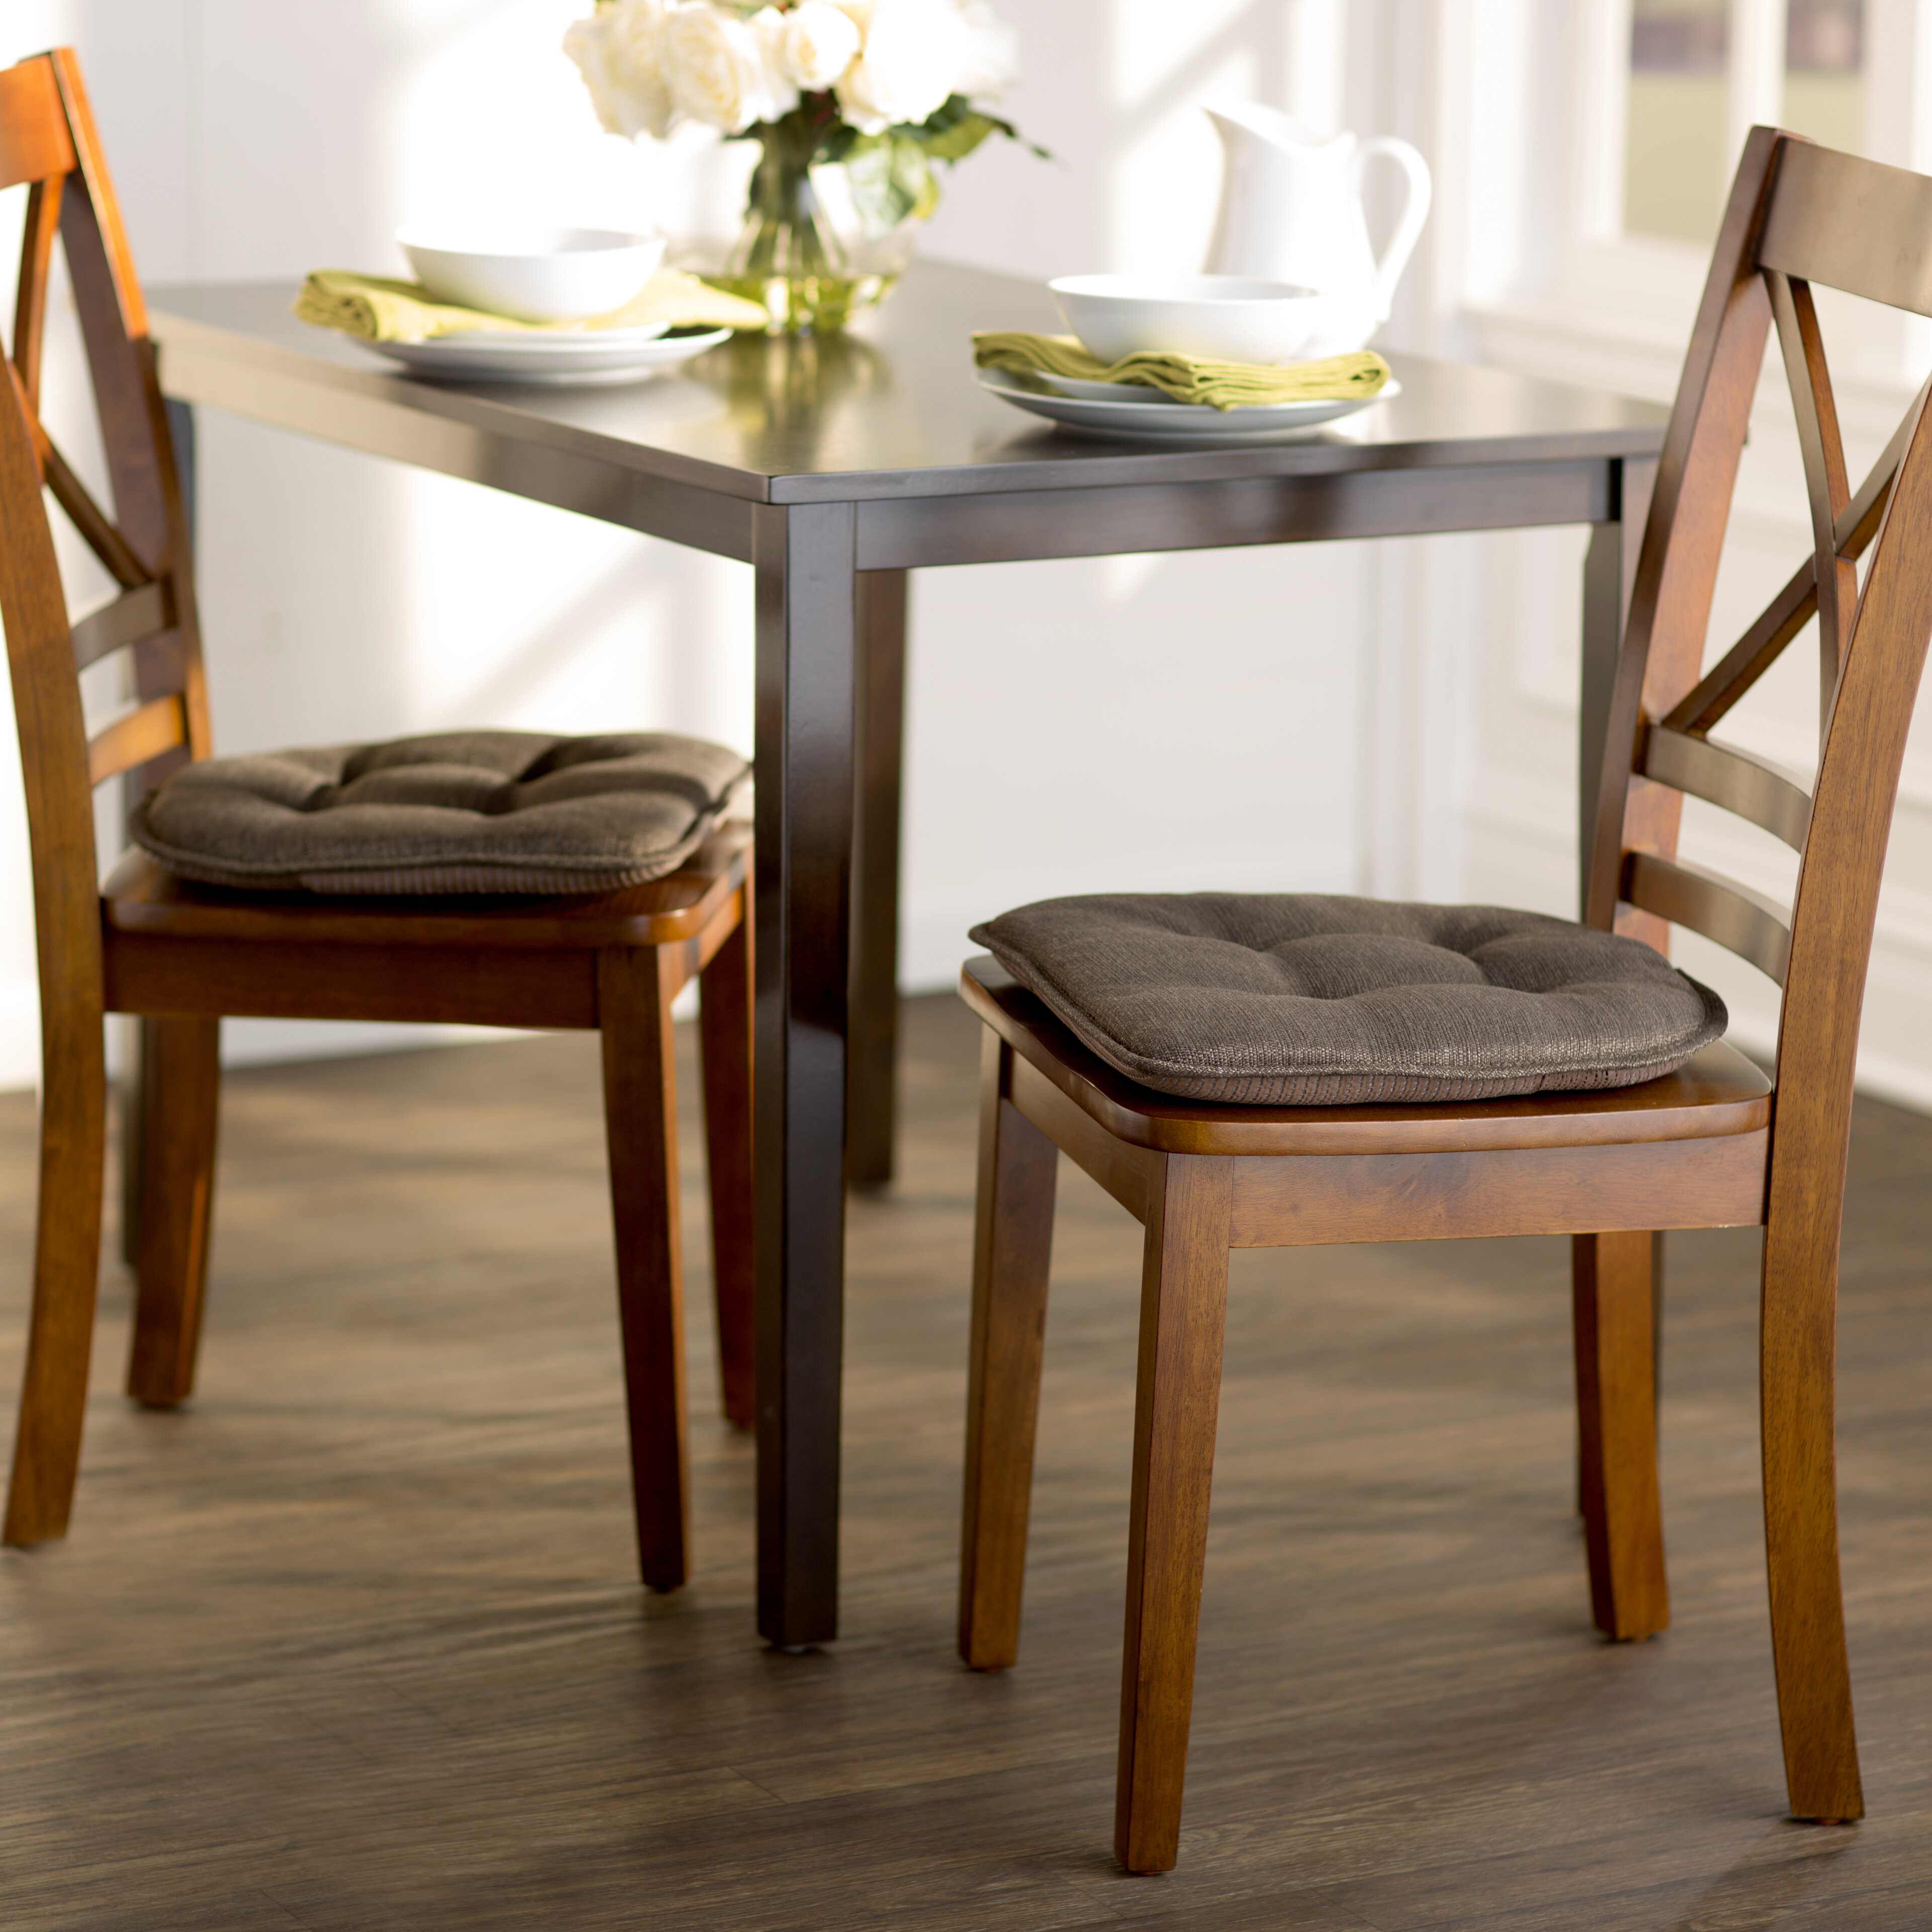 Wayfair BasicsTM Basics Gripped Chair Cushion Set Reviews